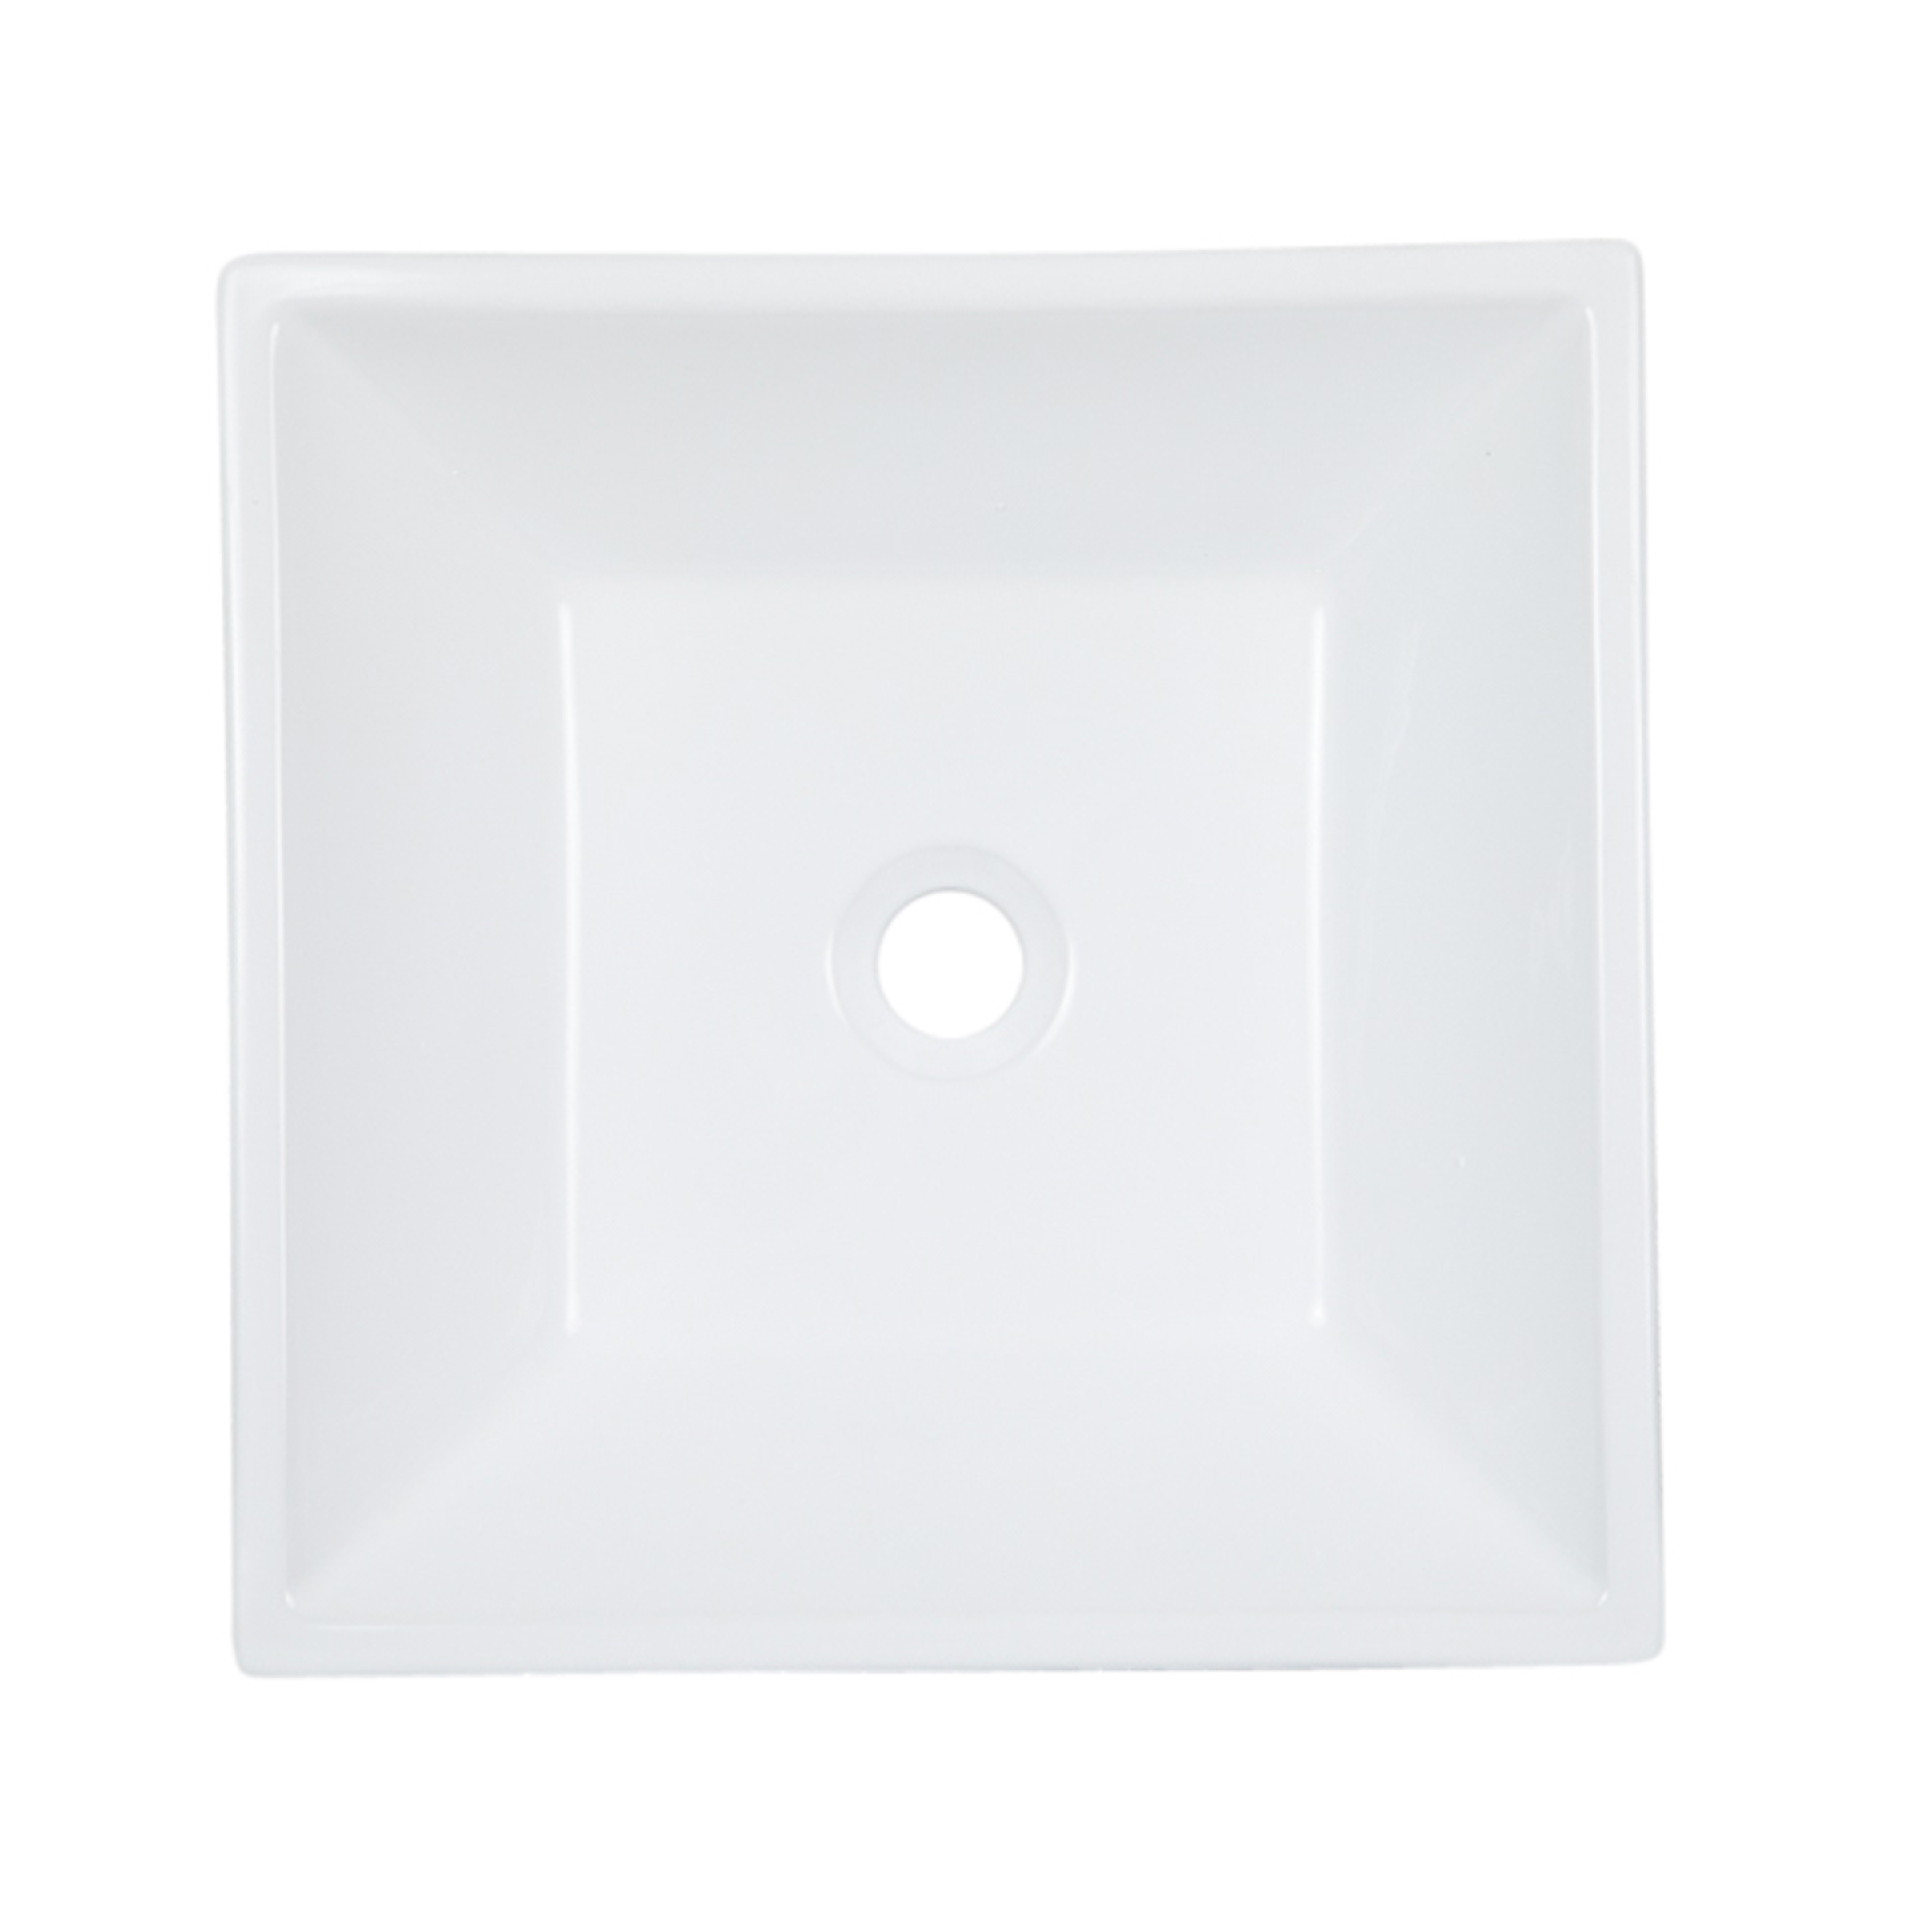 Square Vessel Ceramic Sink